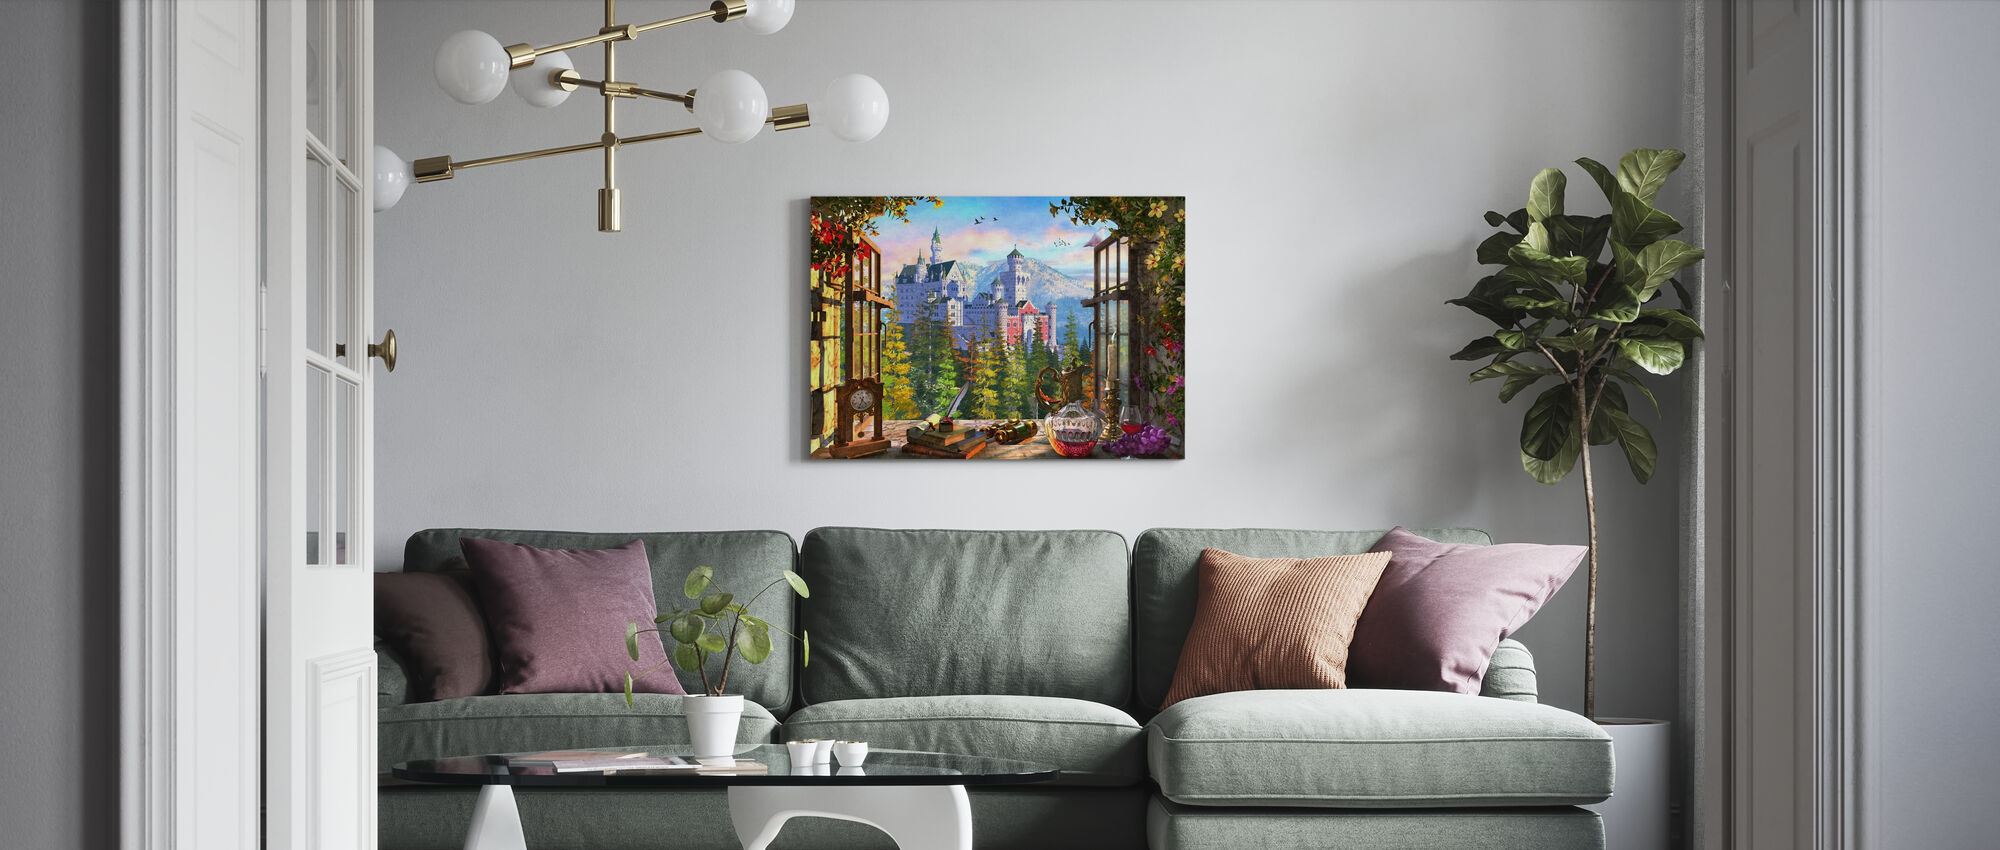 Mountain Castle through Window - Canvas print - Living Room